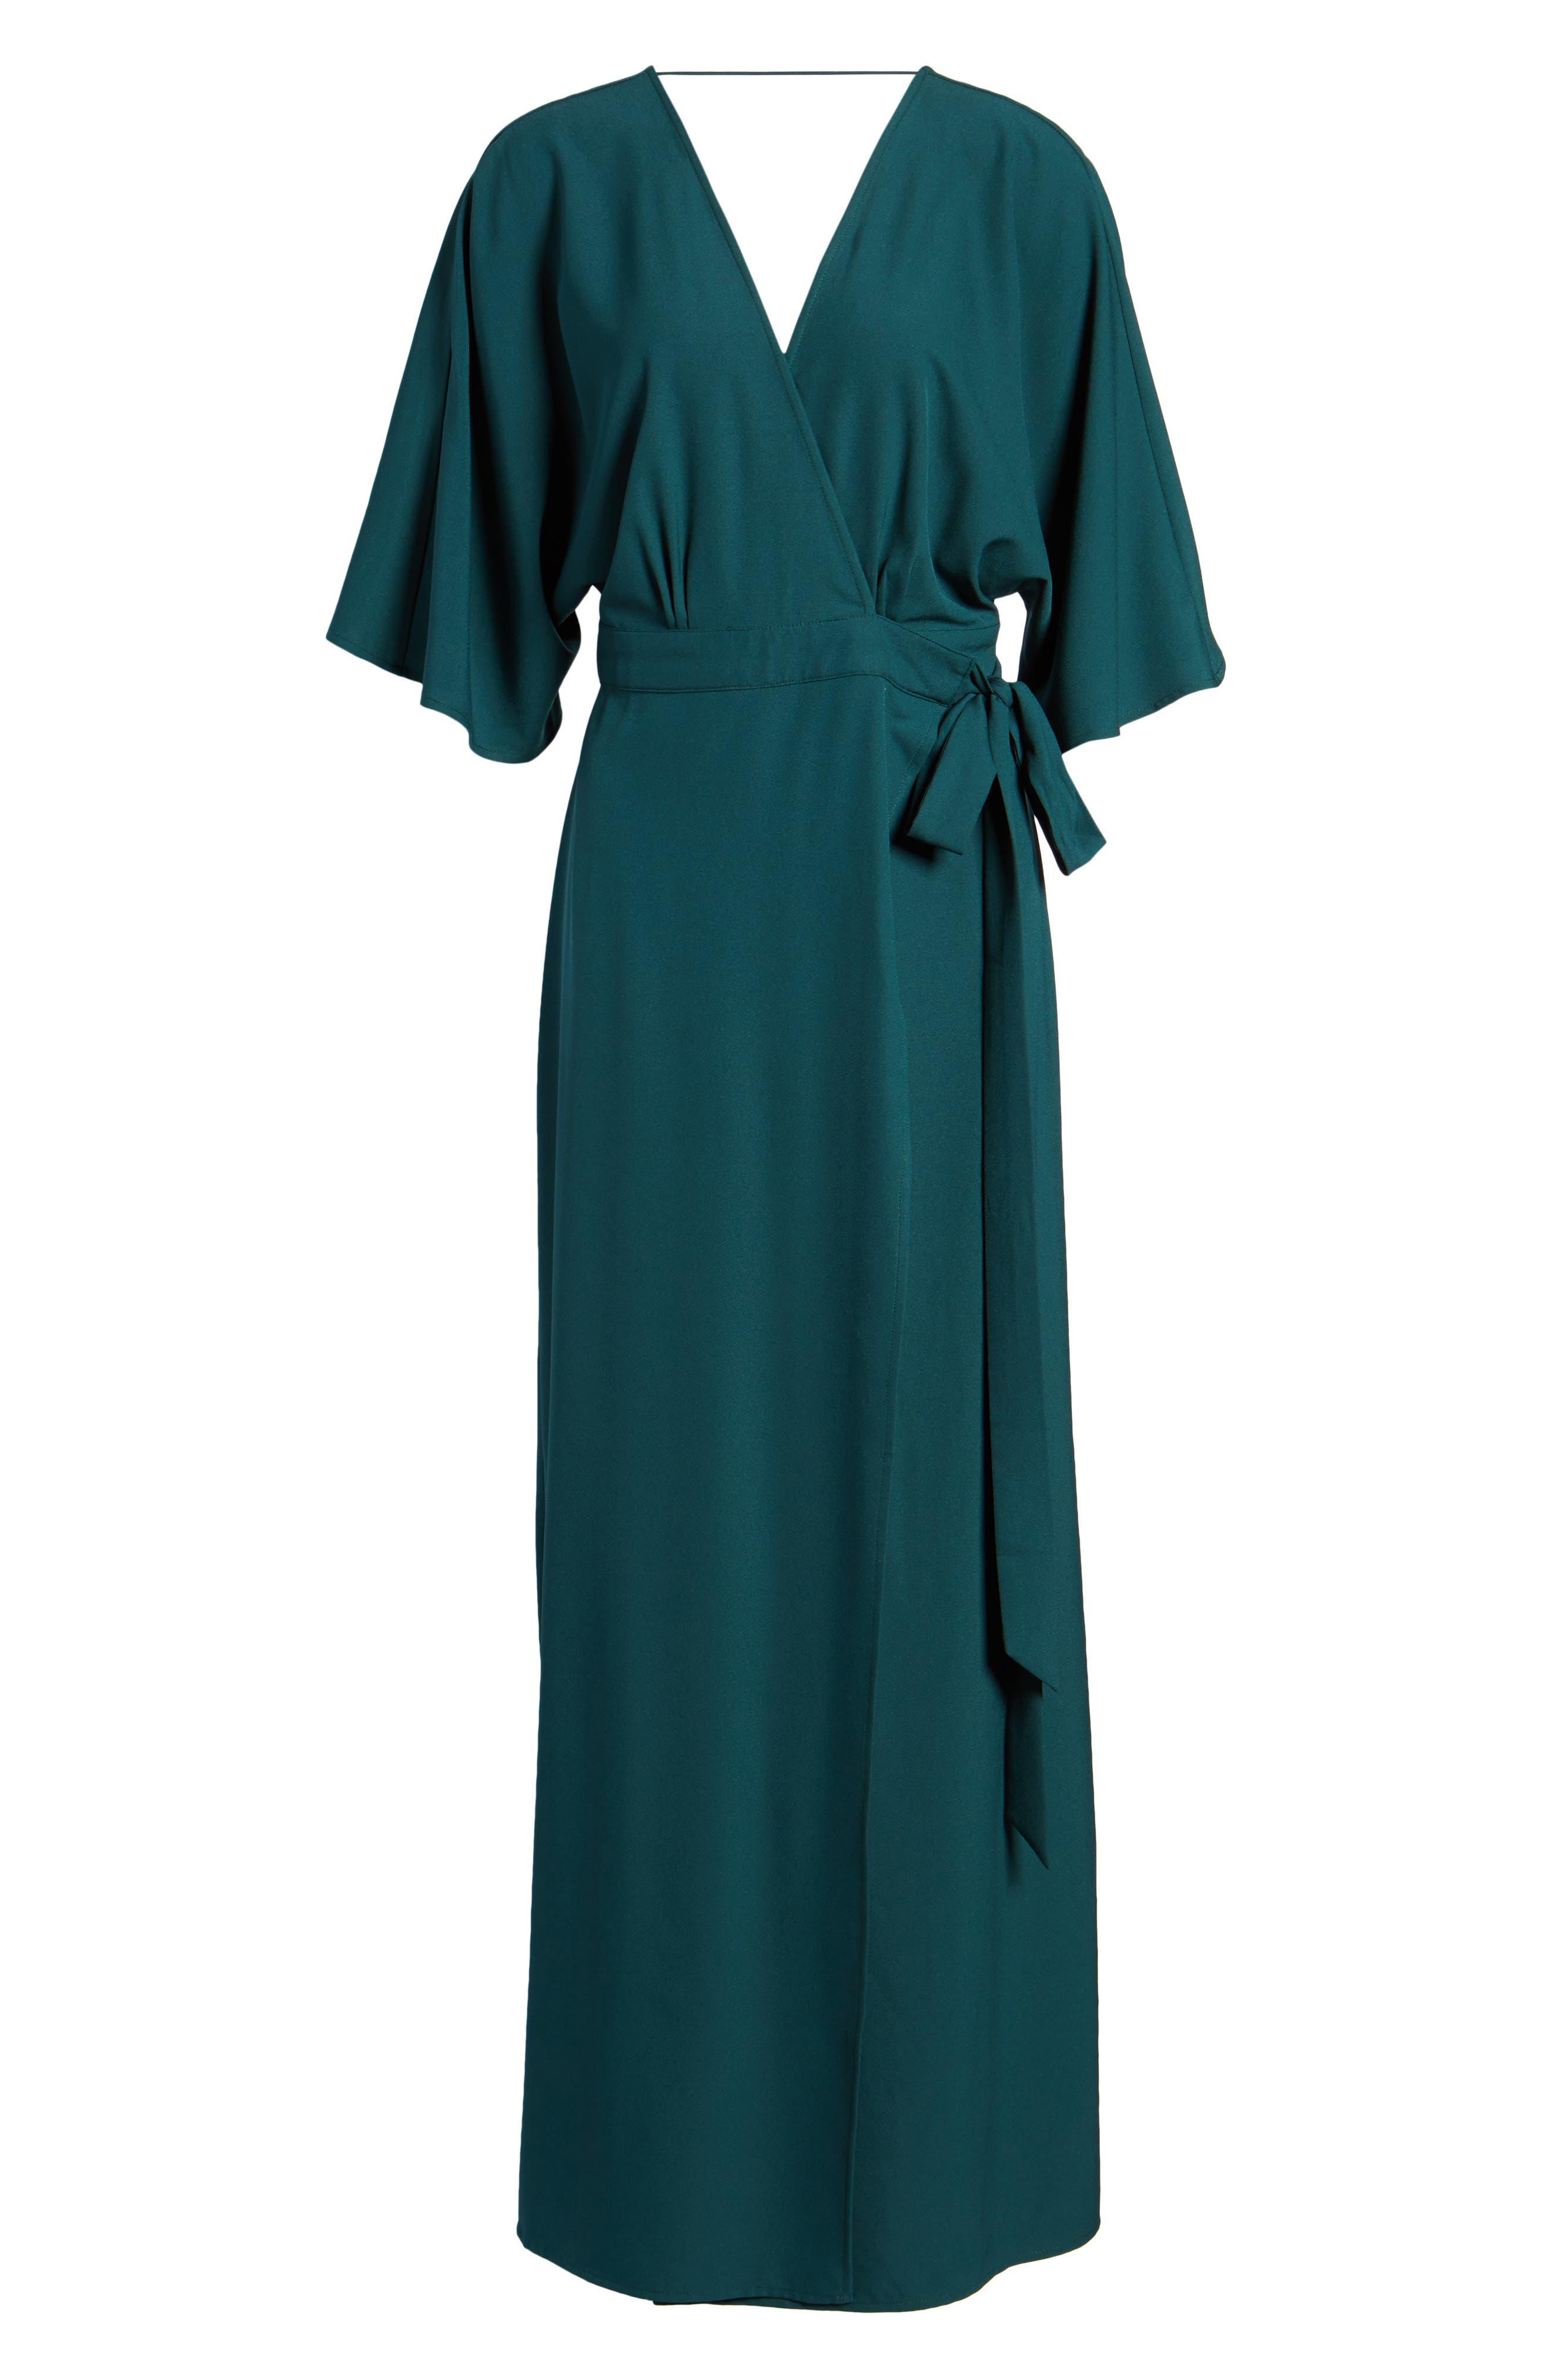 Kimono Maxi Dress,                             Alternate thumbnail 7, color,                             Green Bug